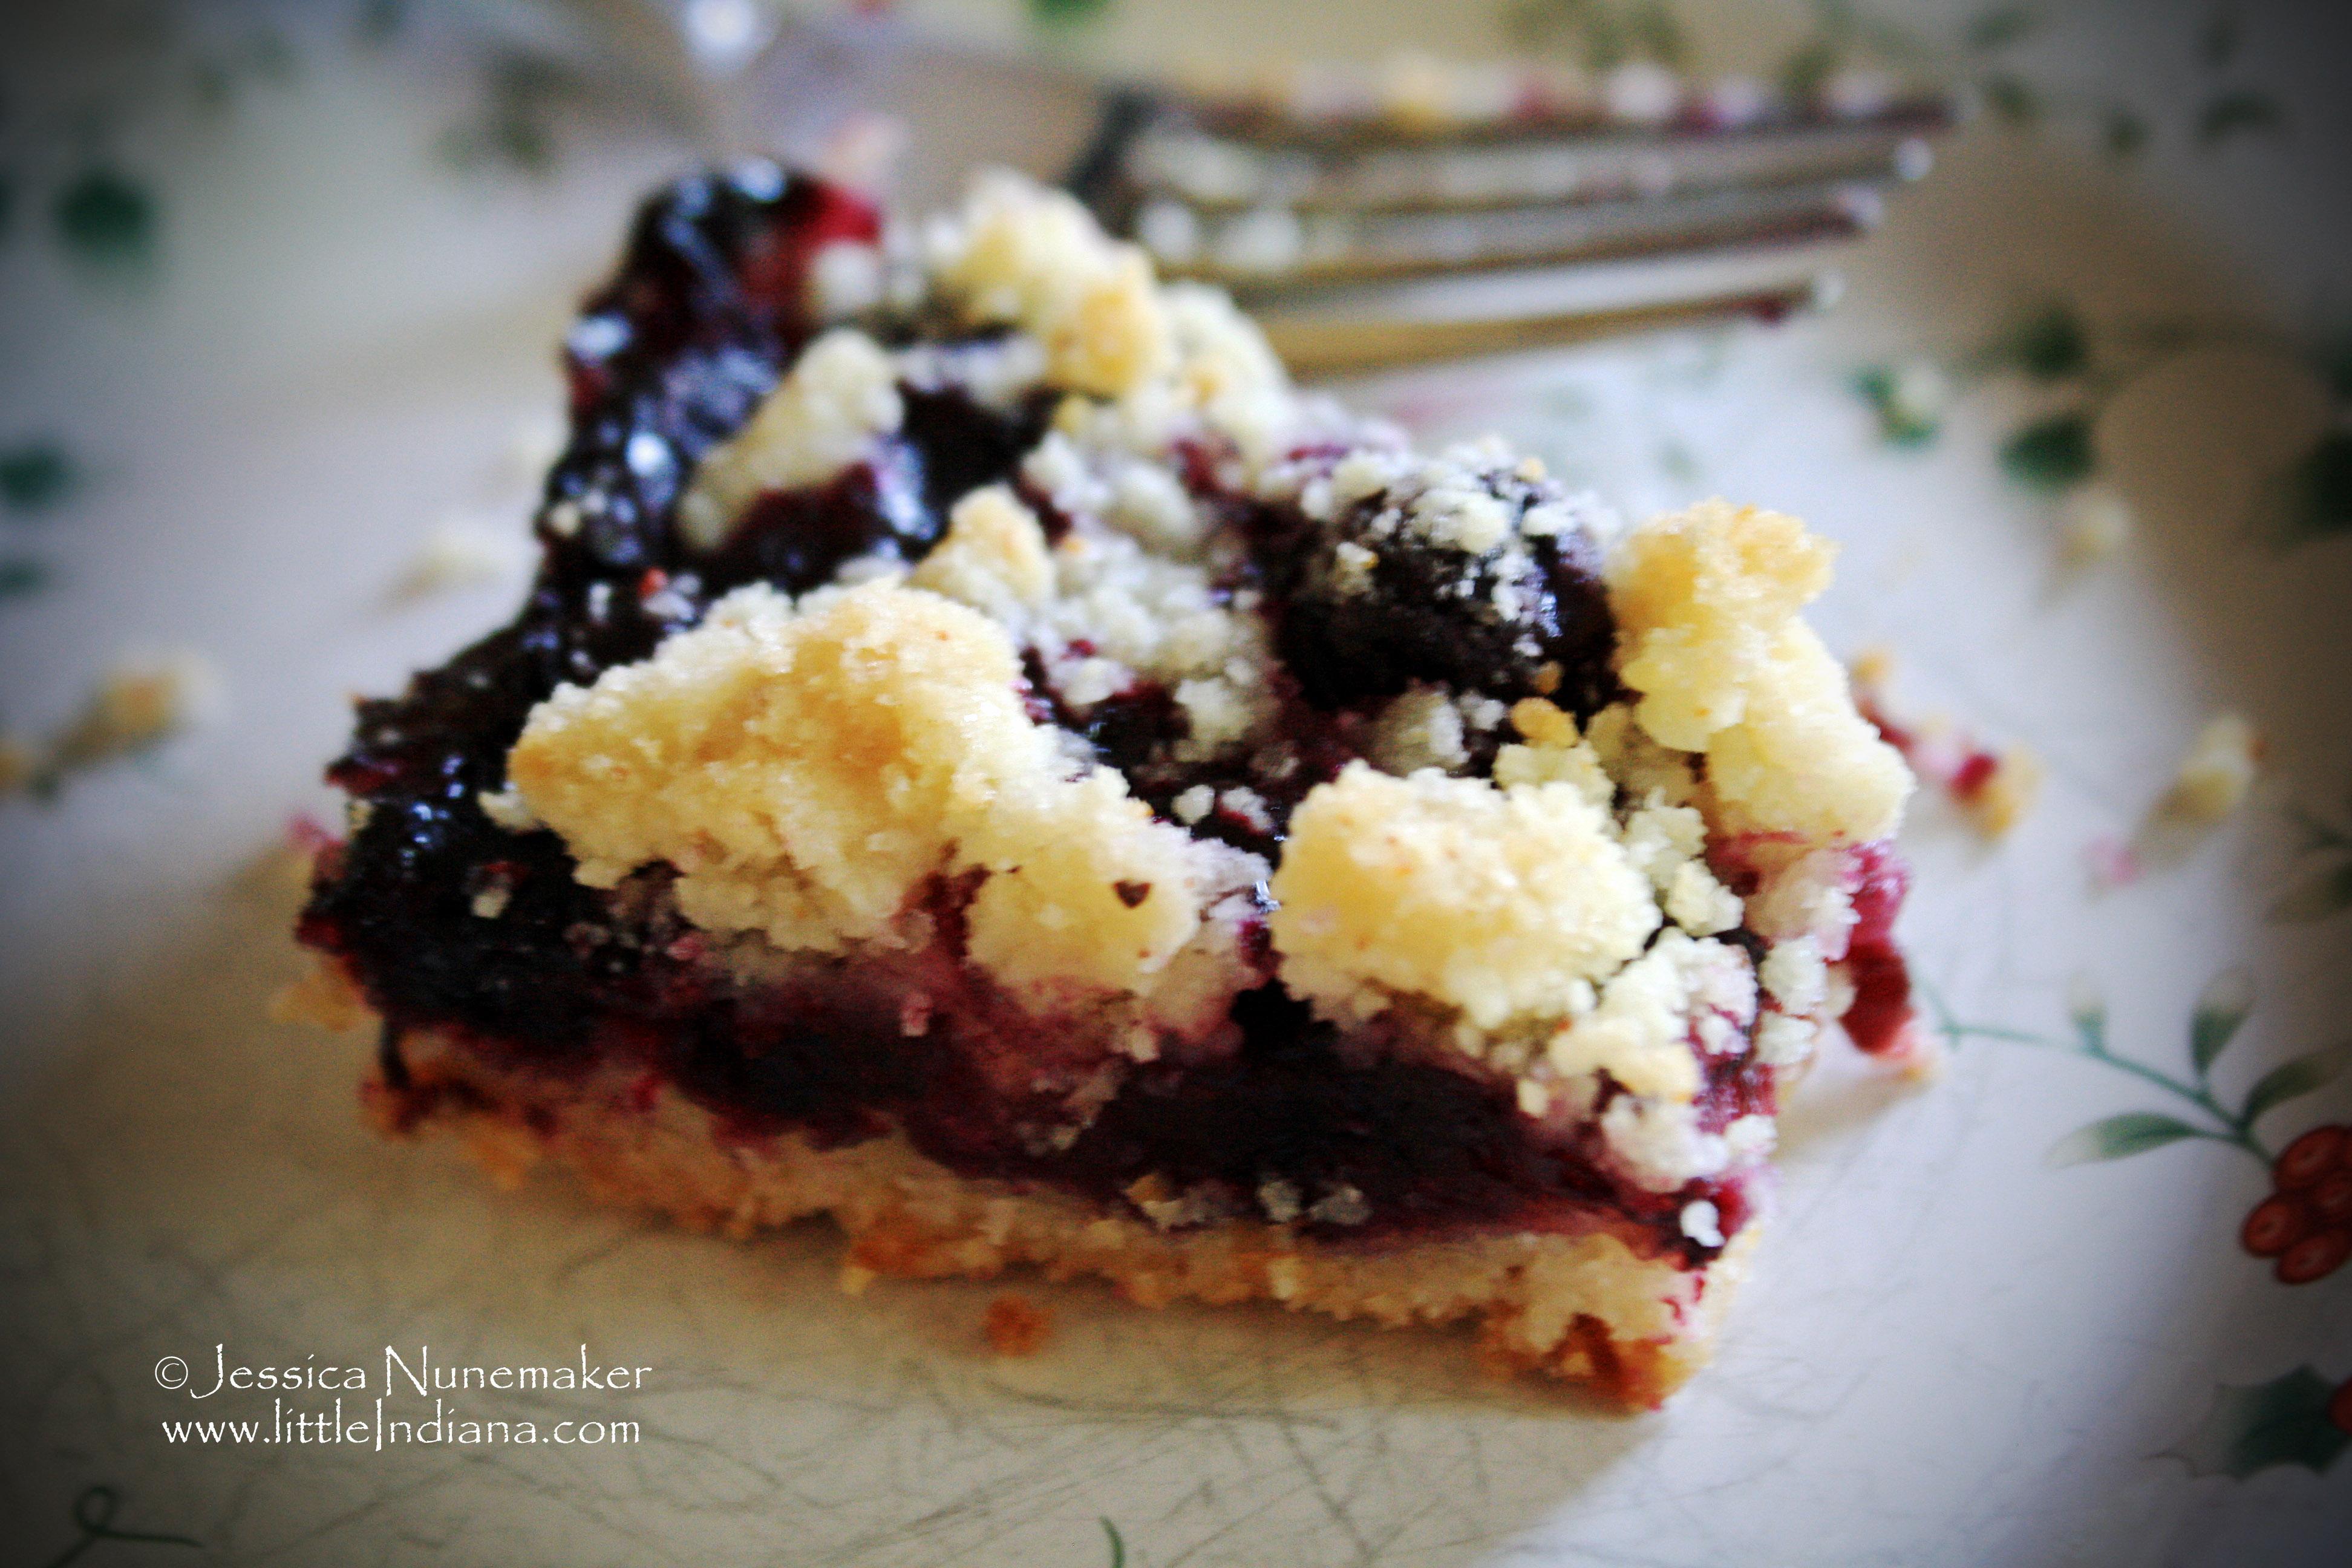 Best Desserts Recipes  Best Dessert Recipes Blueberry Lemon Bars Paperblog